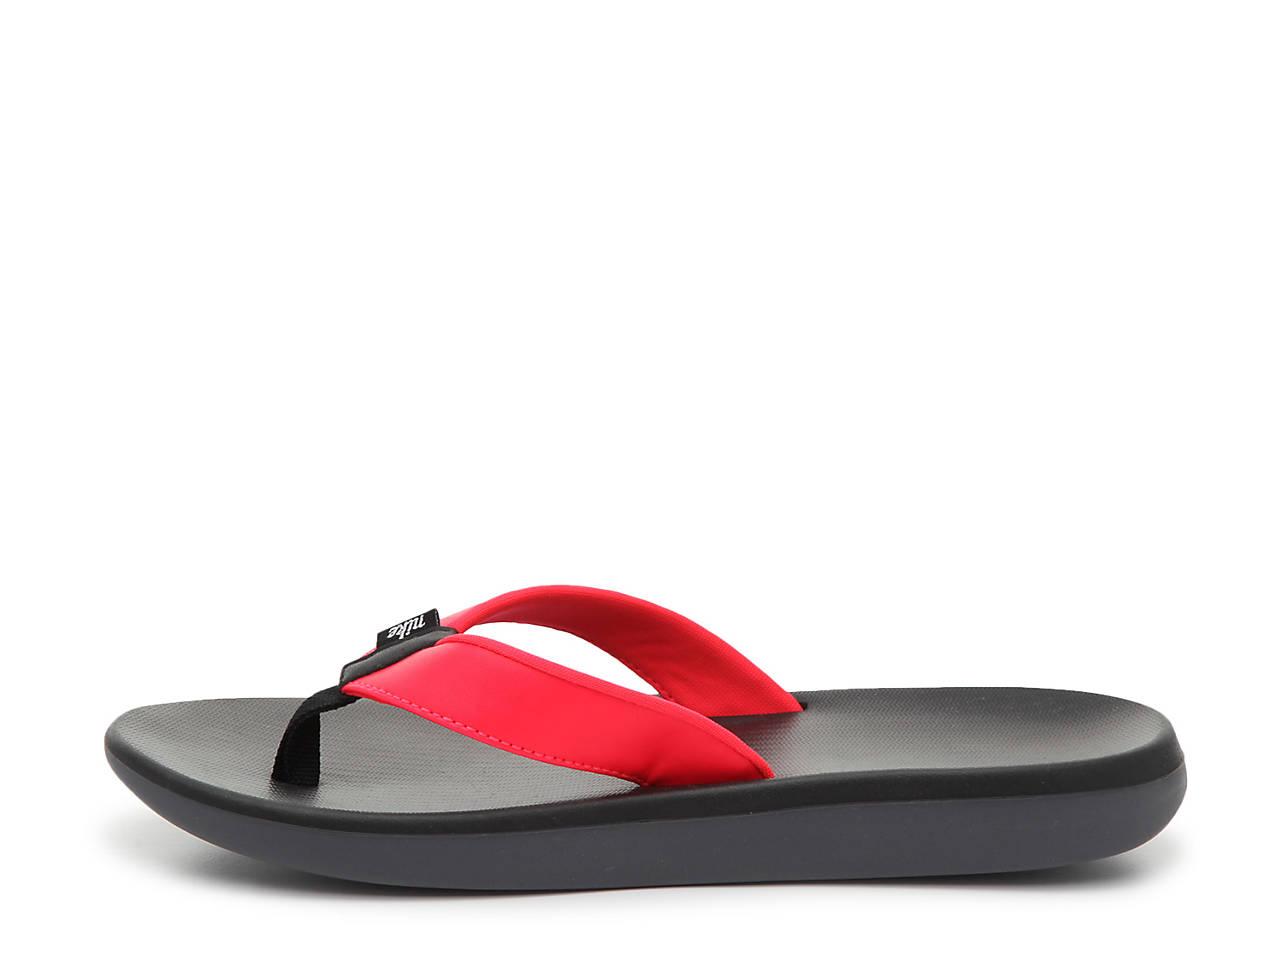 952e4fd65d2 Nike Bella Kai Flip Flop Women s Shoes